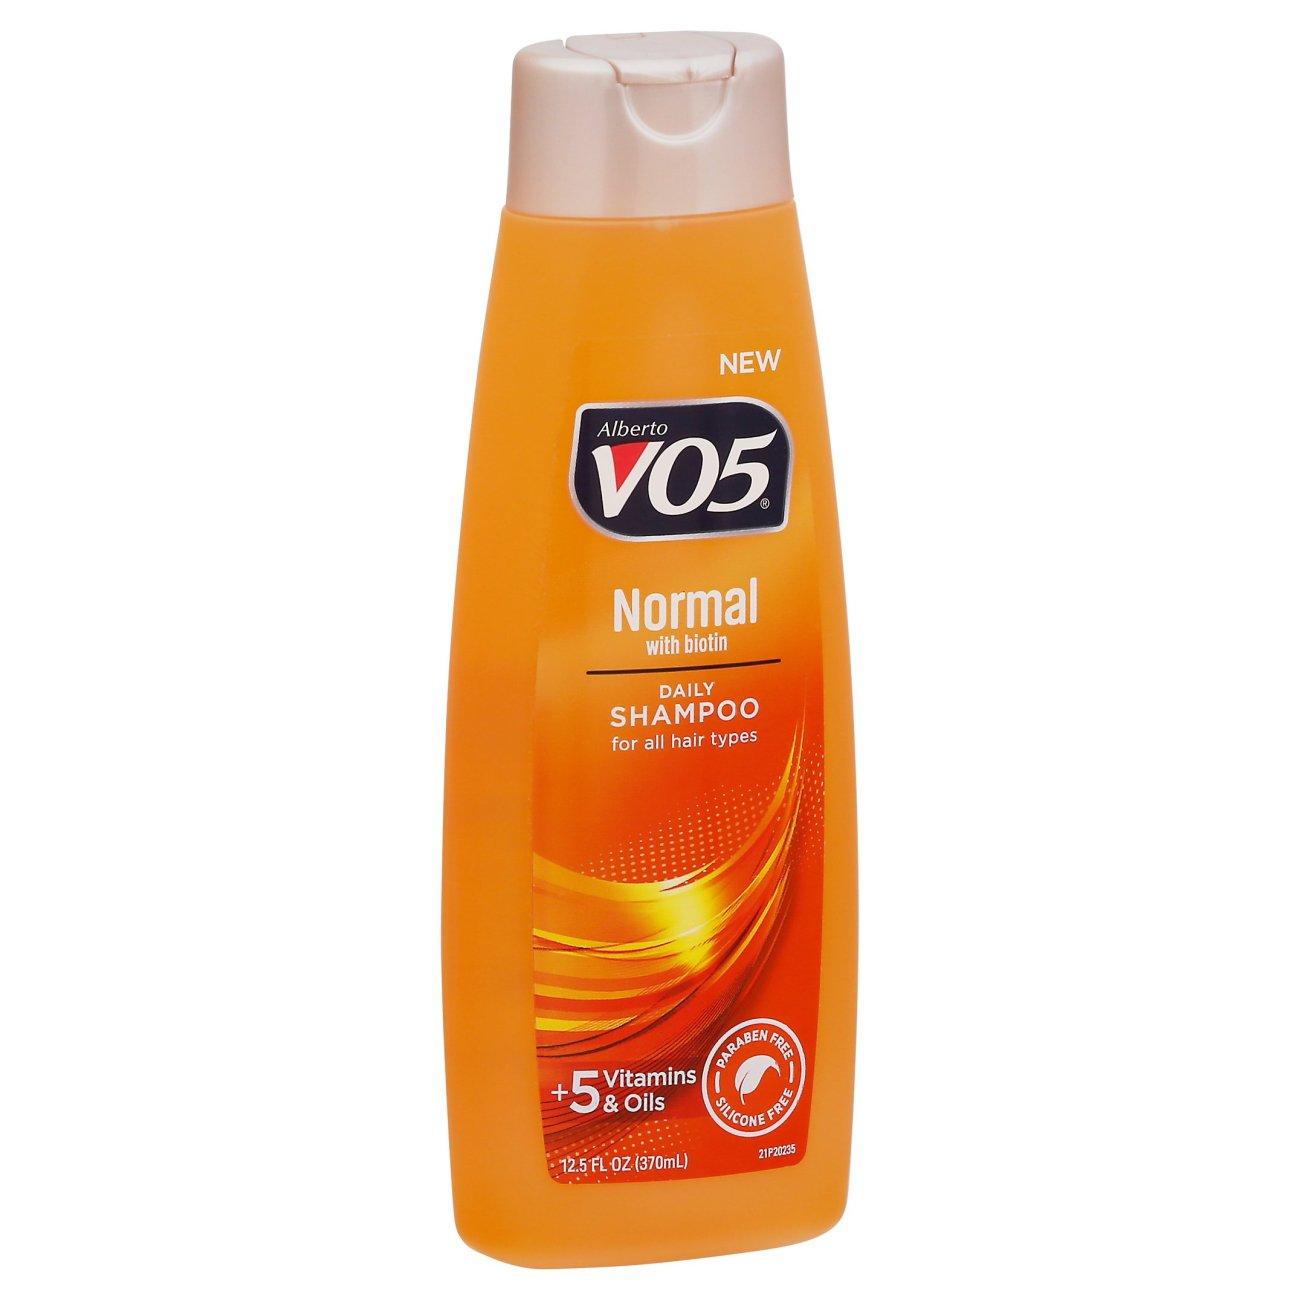 vo5 shampoo